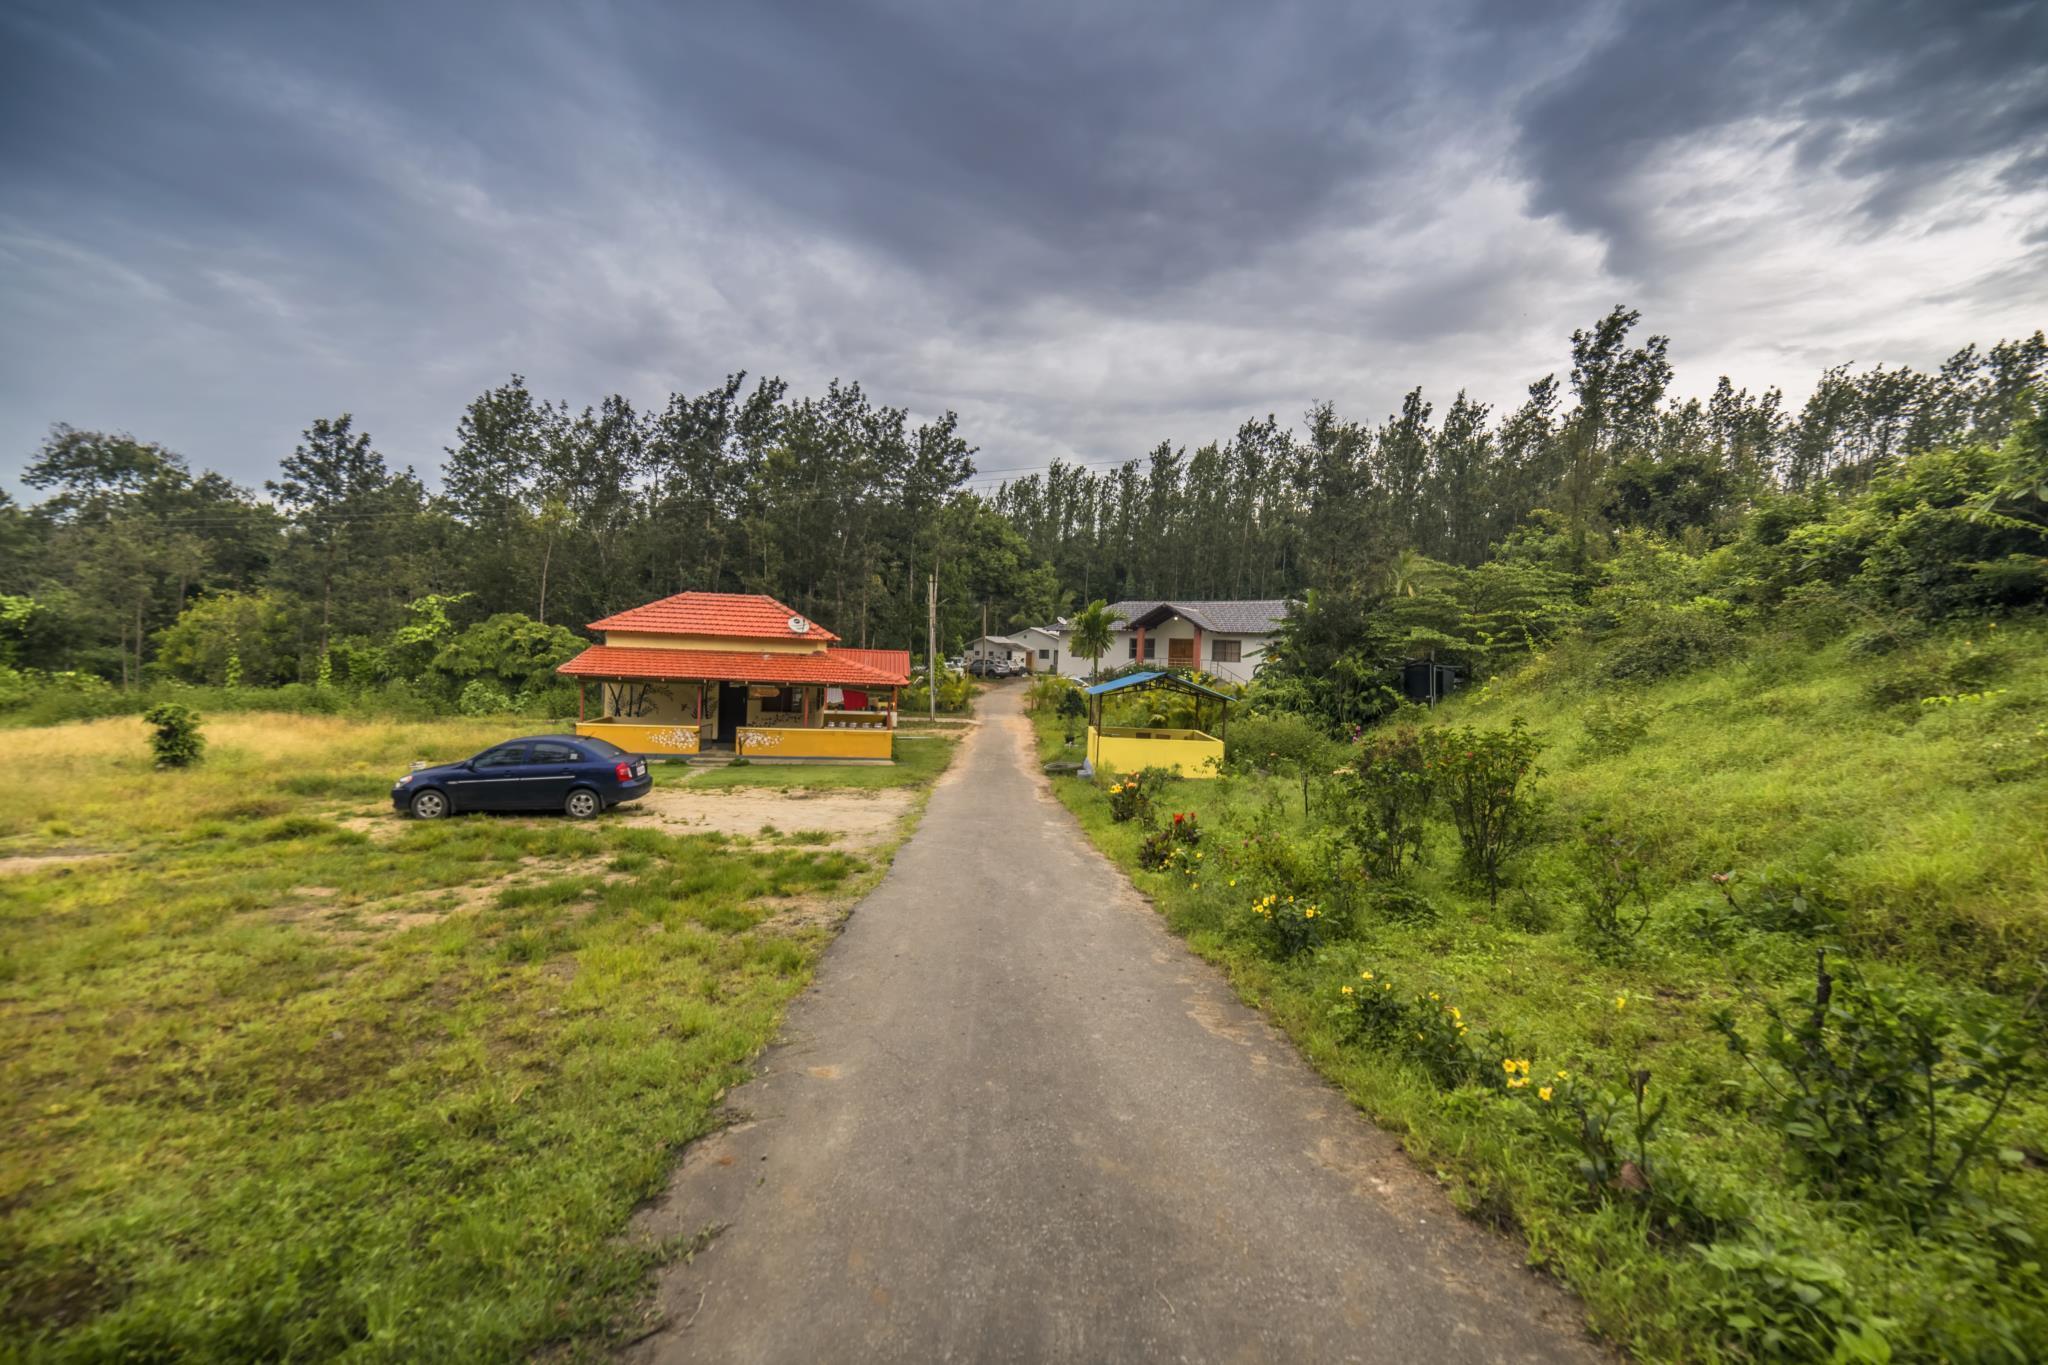 Zostel Chikmagalur, Chikmagalur